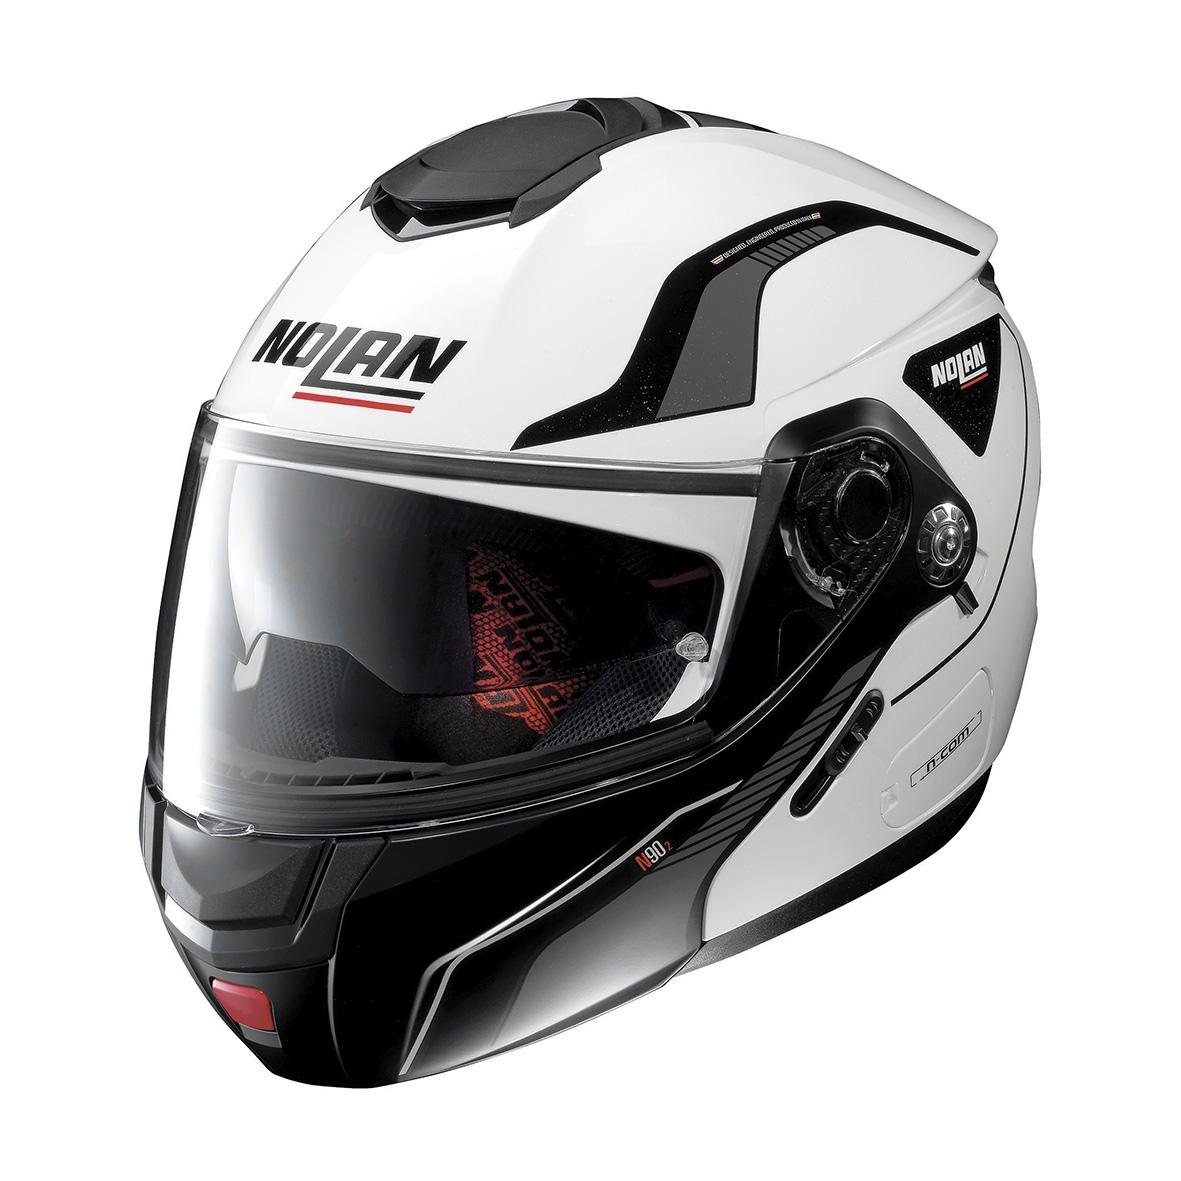 Moto helma Nolan N90-2 Straton N-Com Metal White 17